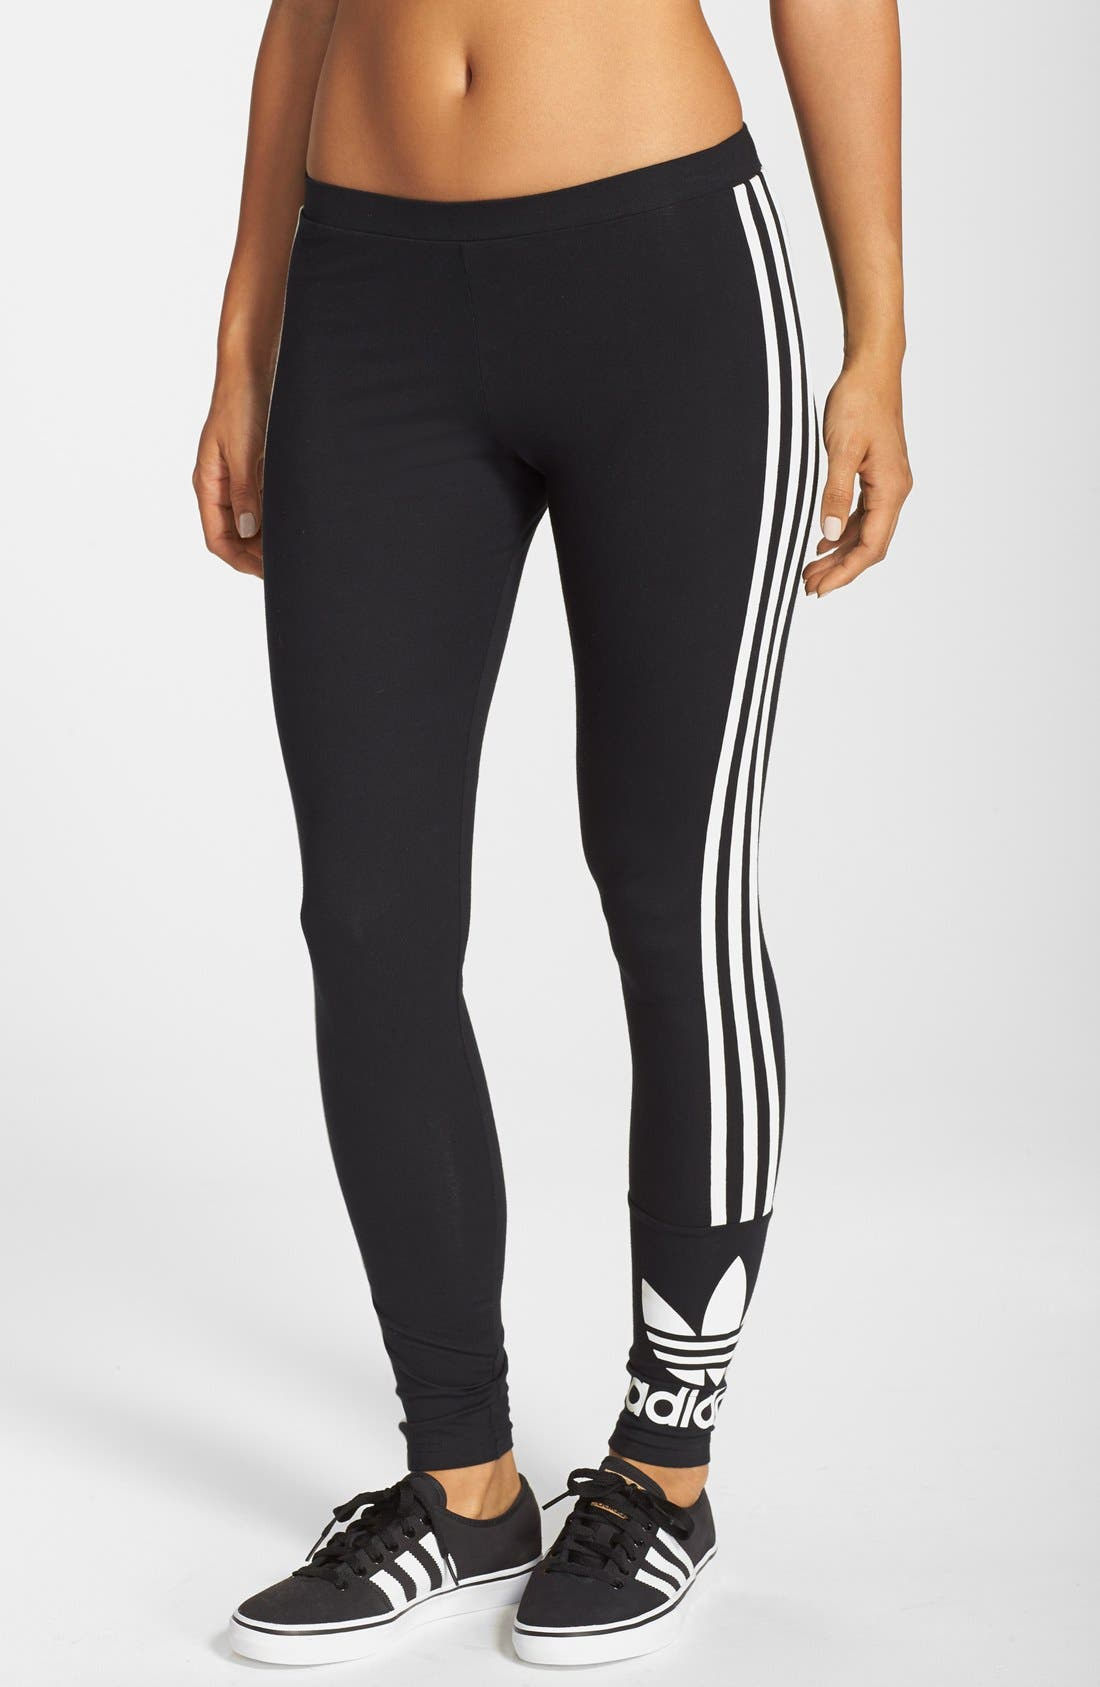 Alternate Image 1 Selected - adidas Originals '3-Stripes' Stretch Cotton Leggings